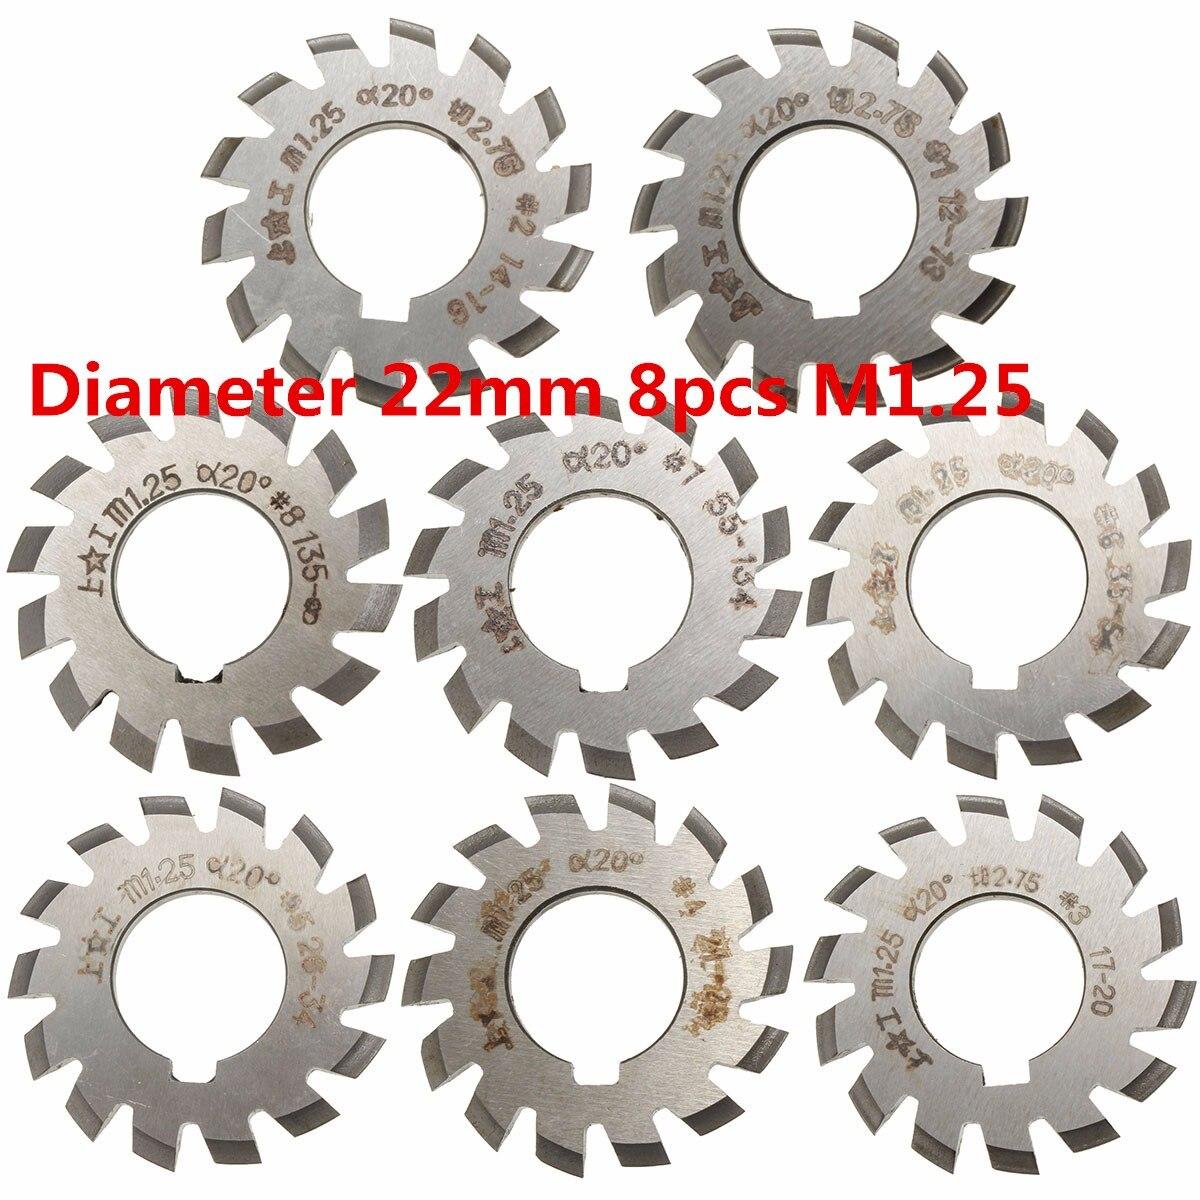 Module 1.25 M1.25 PA20 Degrees Bore 22mm #1-8 HSS Involute Gear Milling Cutter High Speed Steel Milling Cutter Gear Cutting Tool